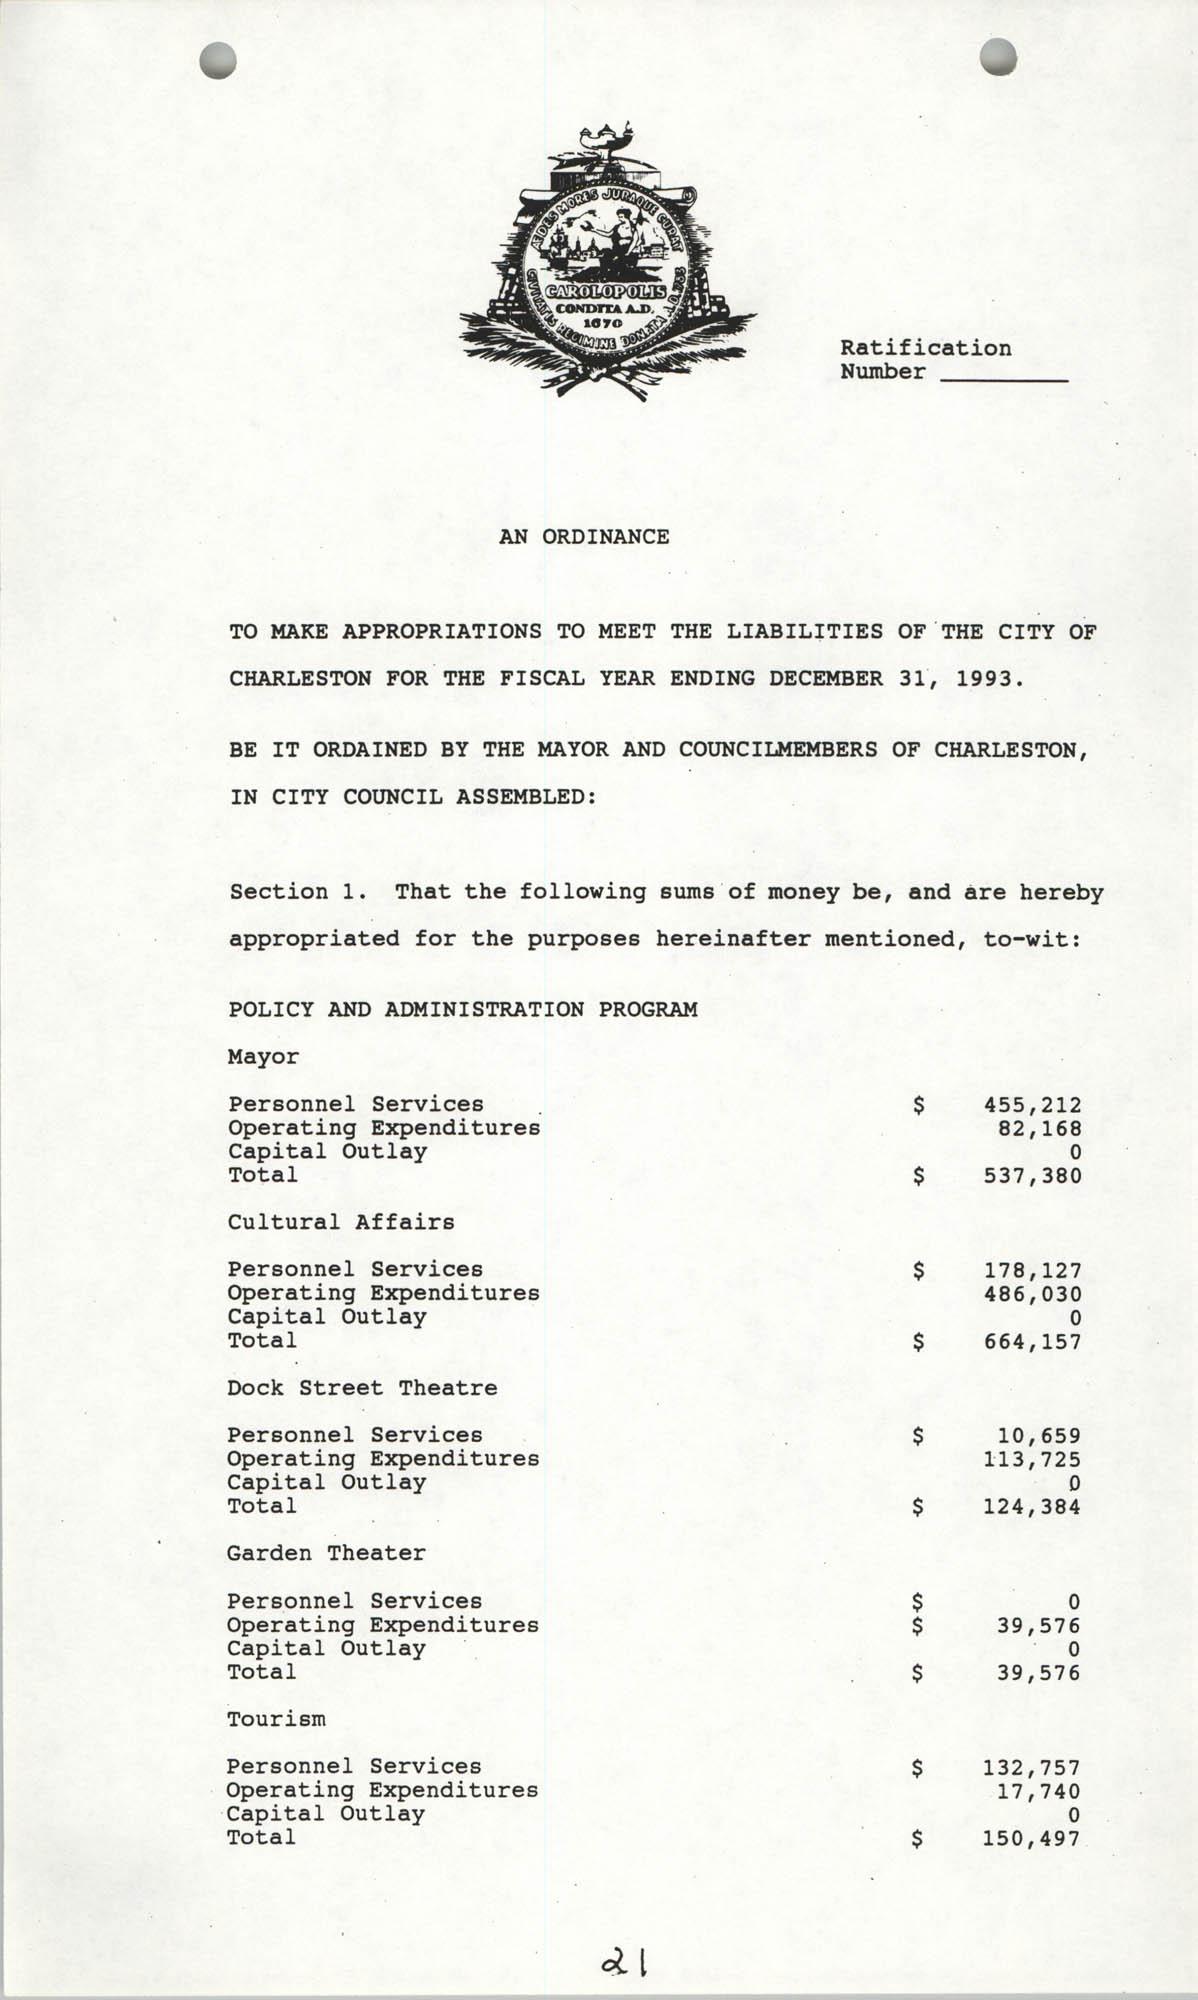 The City Council of Charleston, South Carolina, 1993 Budget, Page 21